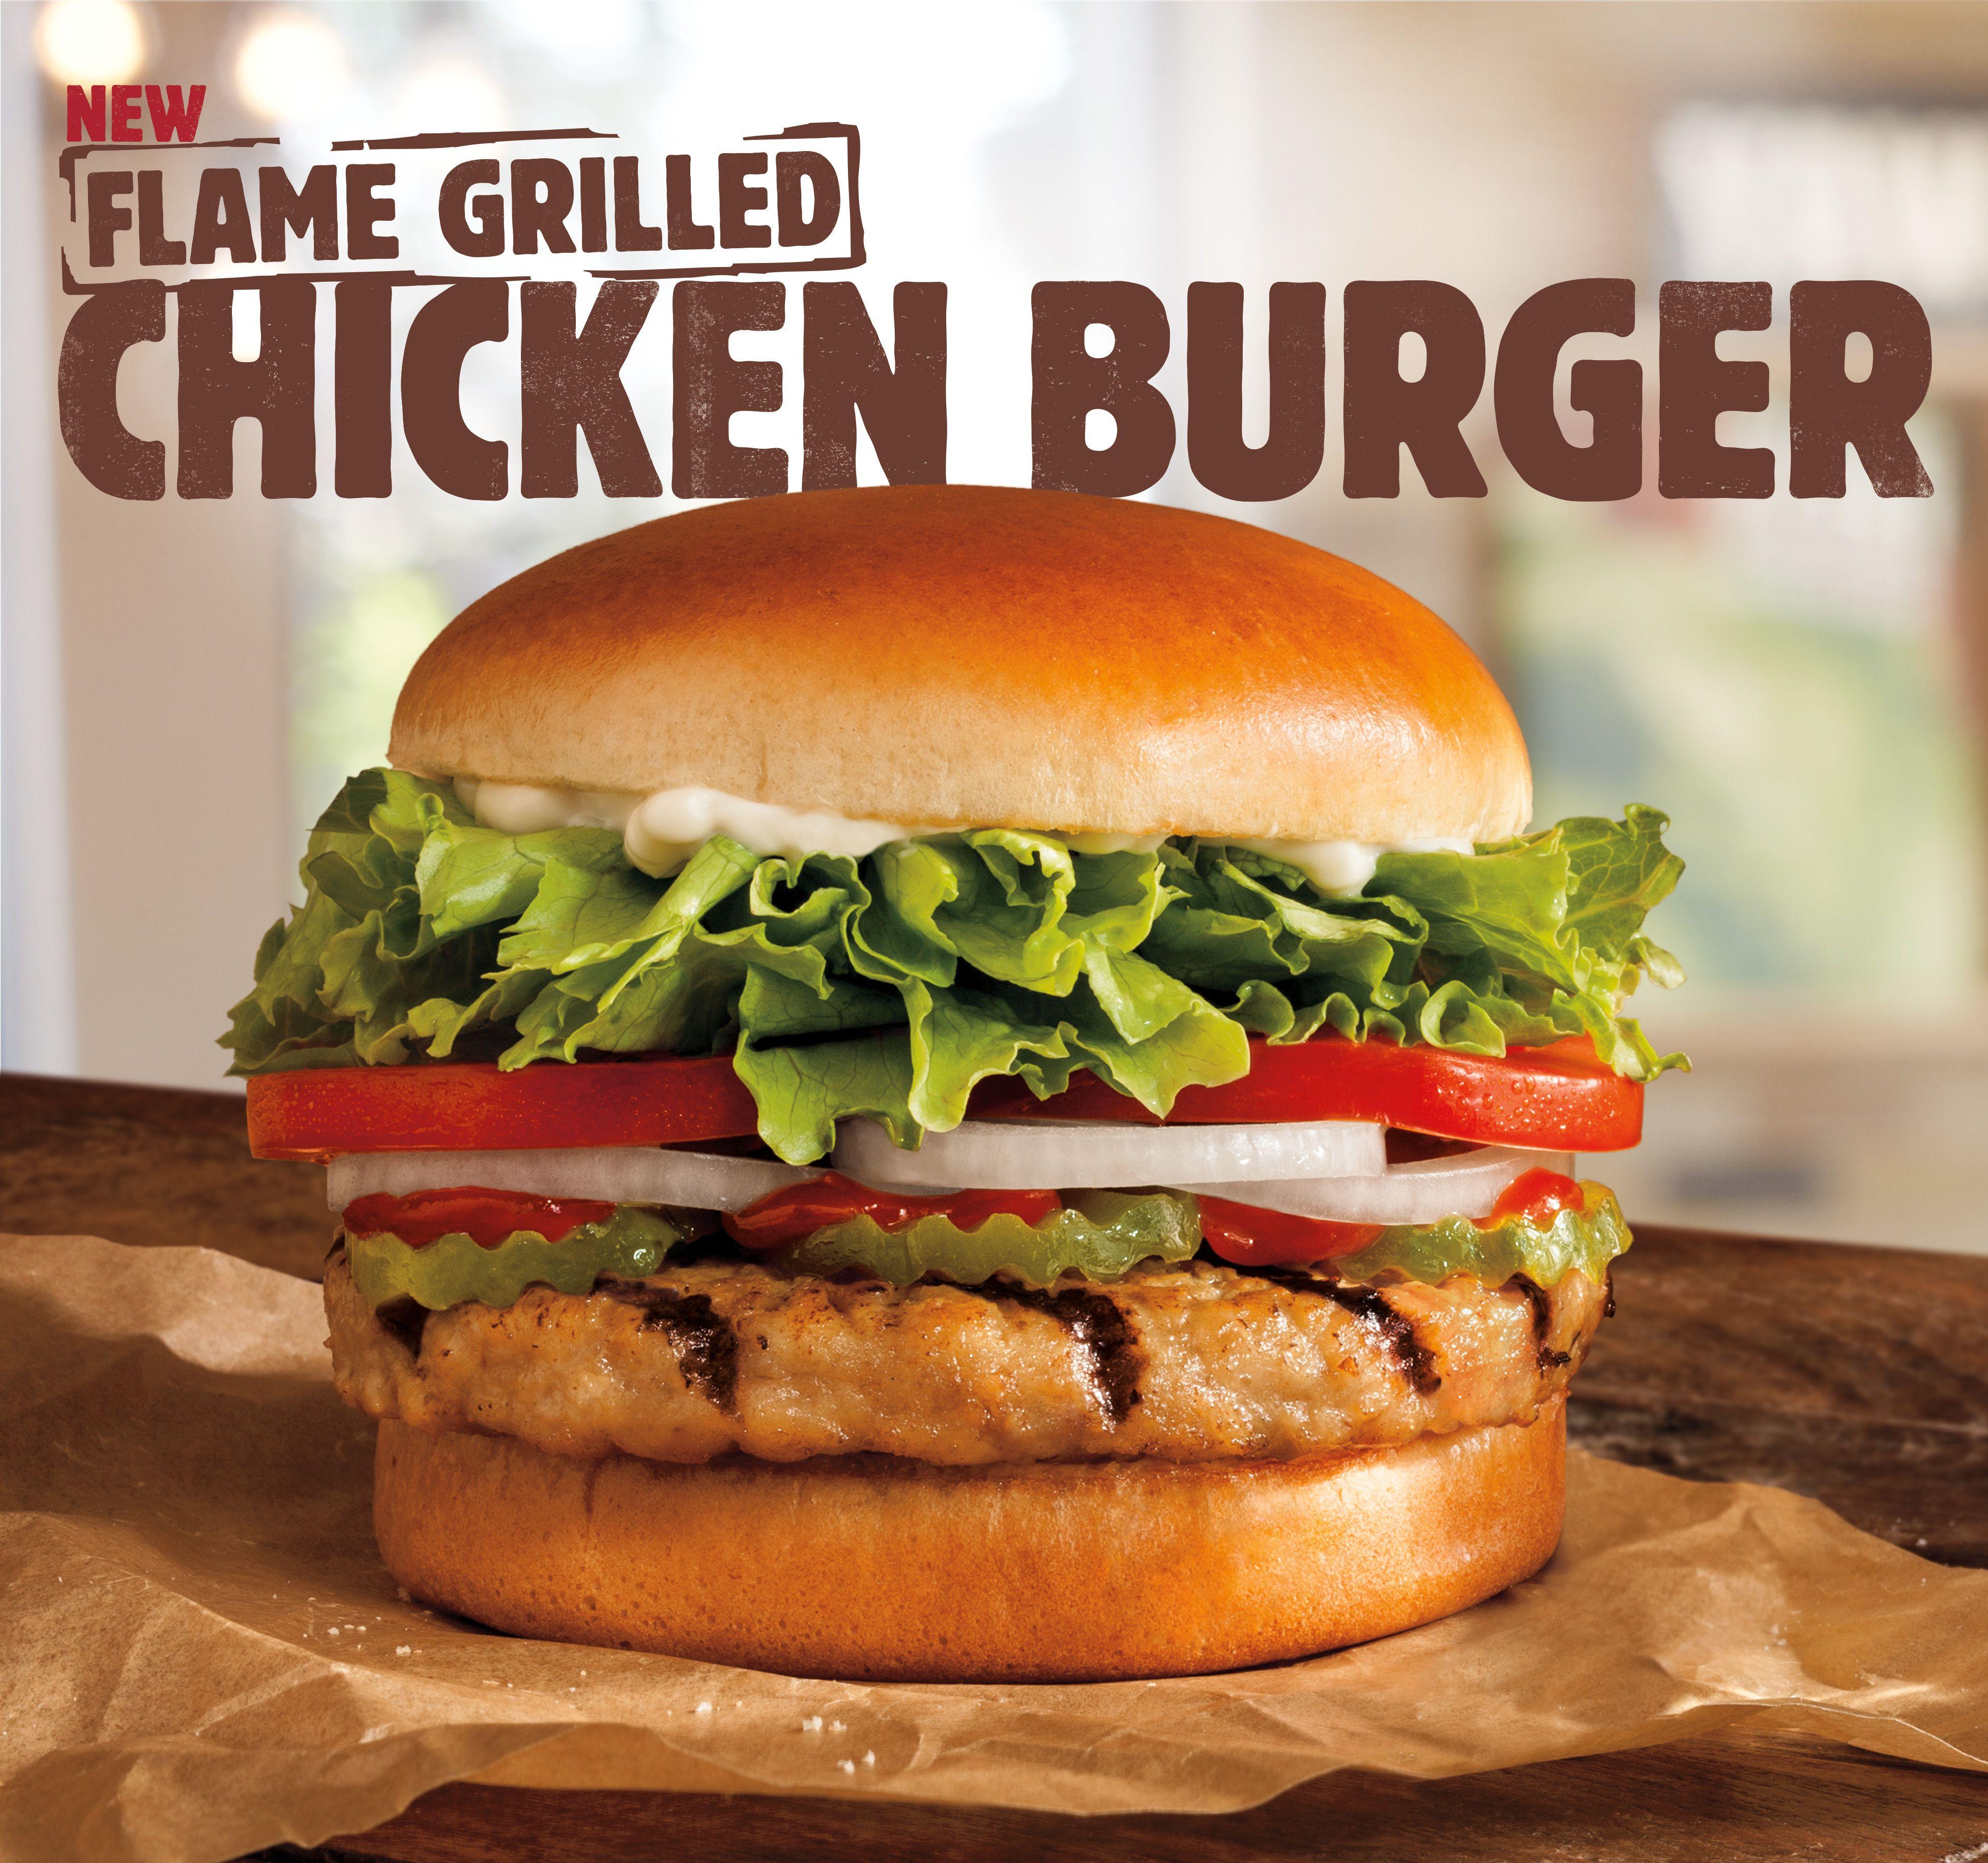 BURGER KING® Restaurants Introduce Flame Grilled Chicken Burger